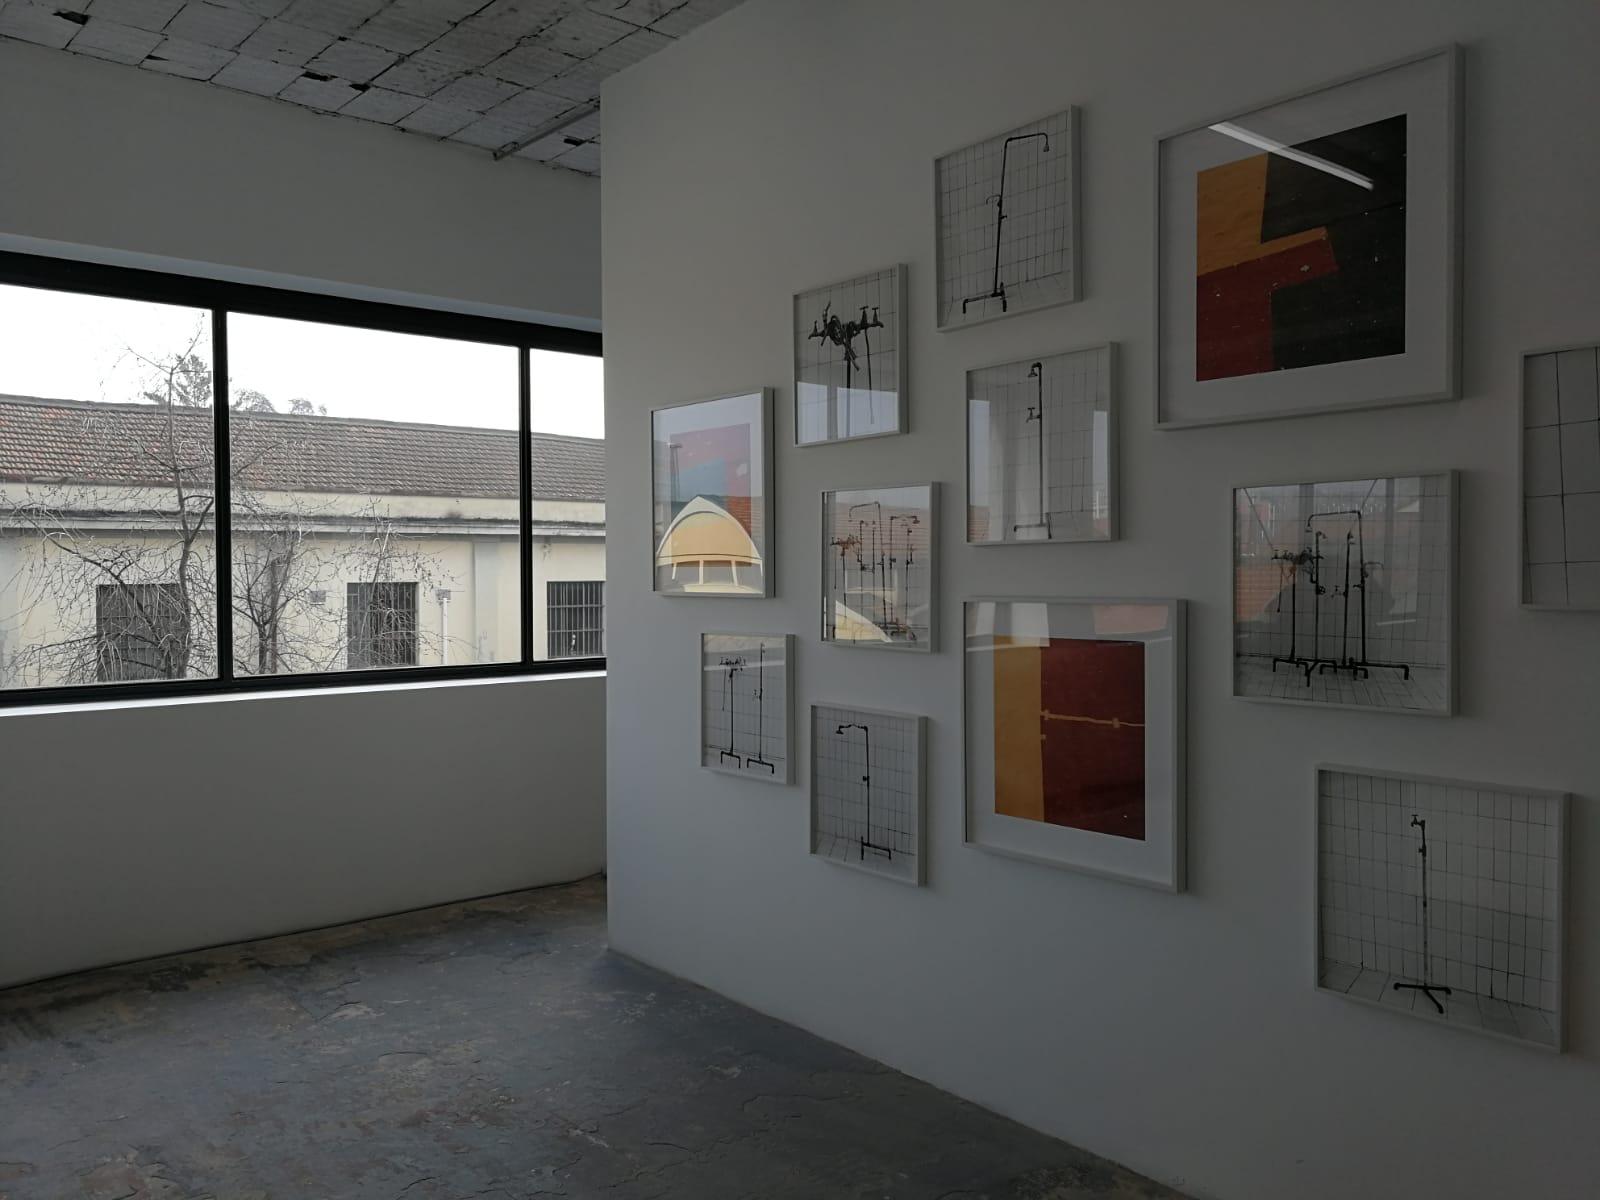 Yto Barrada, Plumper Assemblage e Untitled (felt circus flooring, Tangier), ICA Milano. Foto Artslife